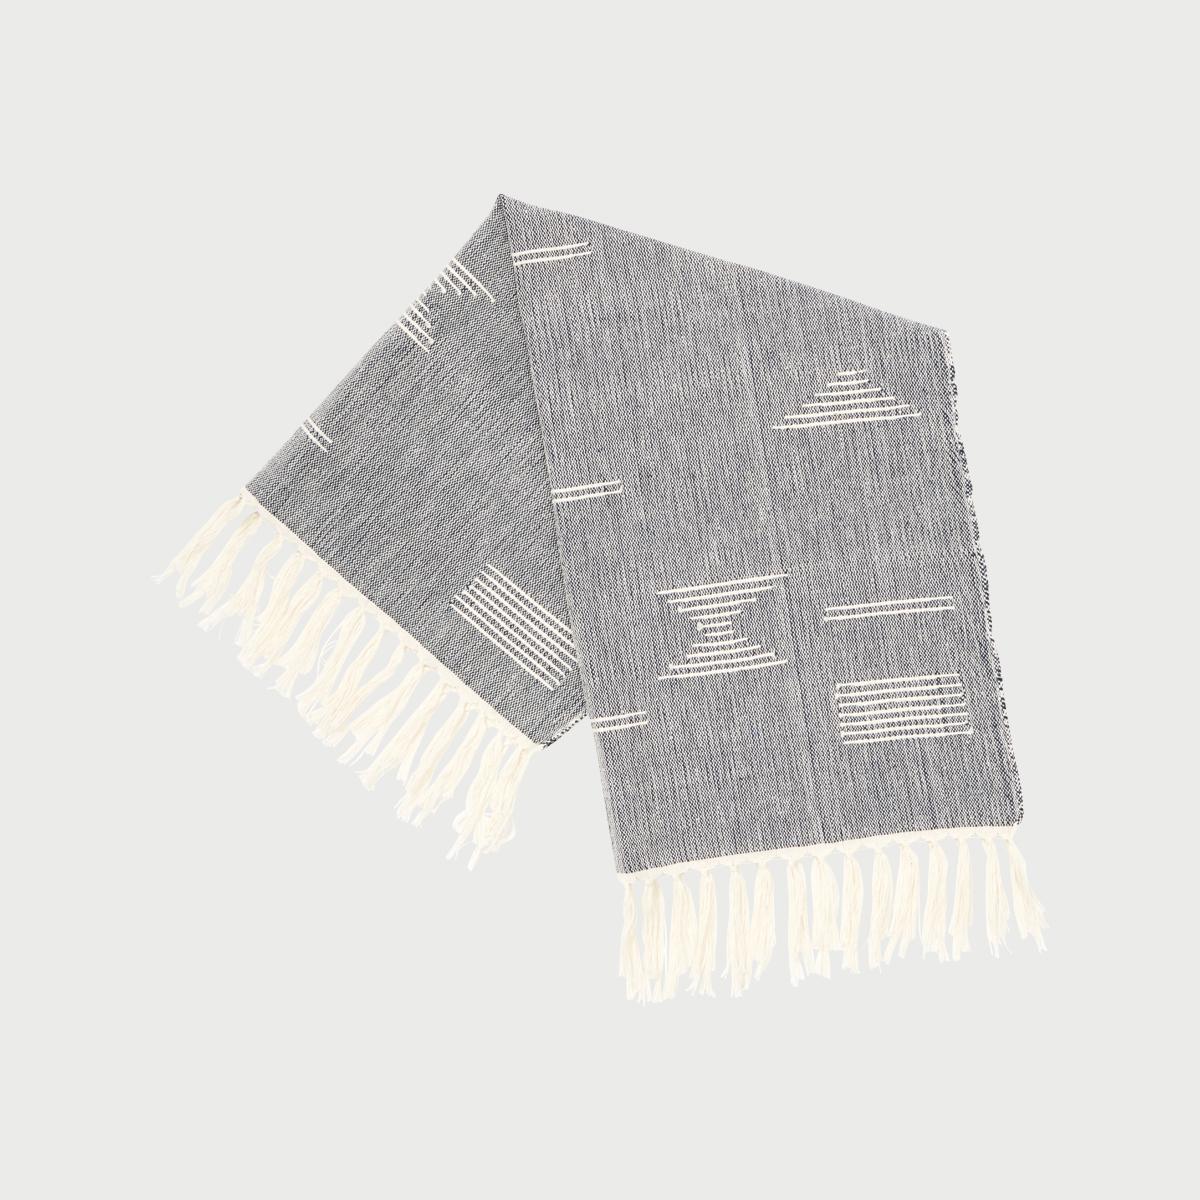 Towel shapesblue 1